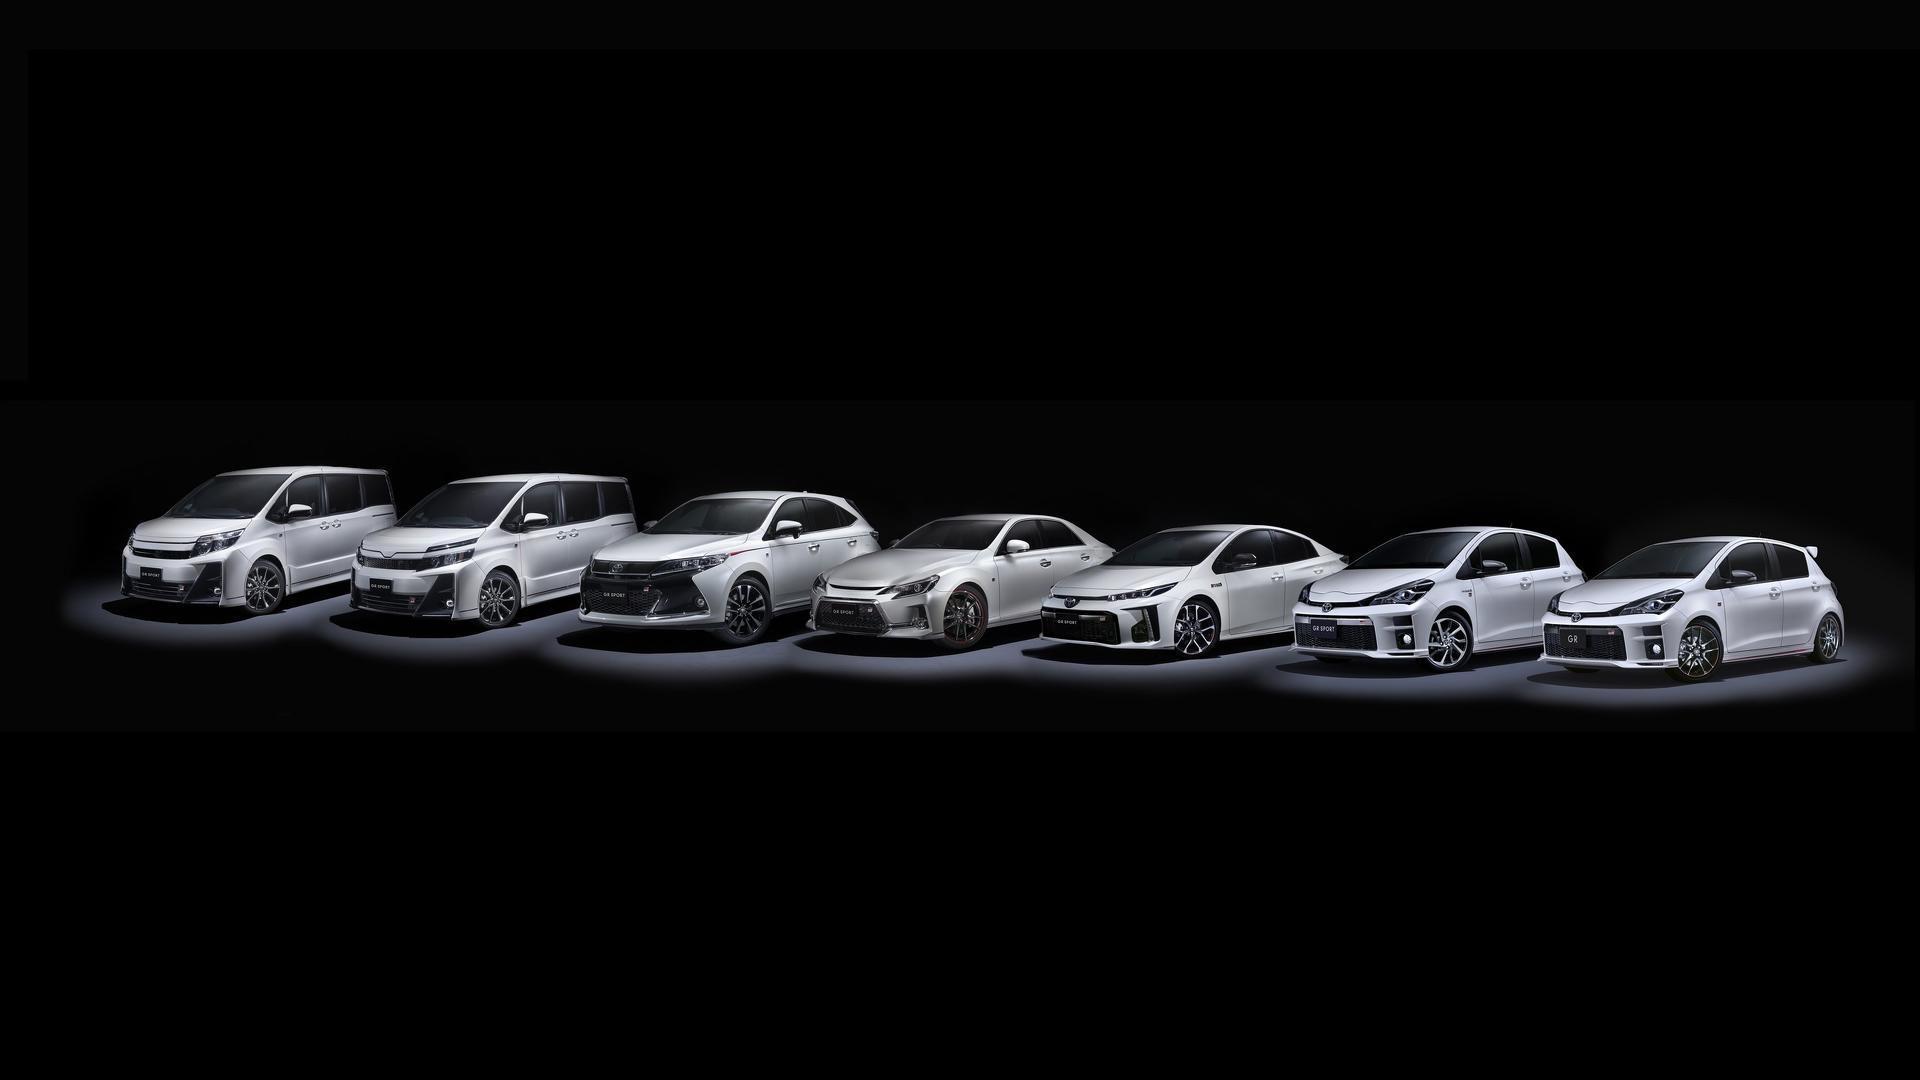 2018 Toyota GR lineup